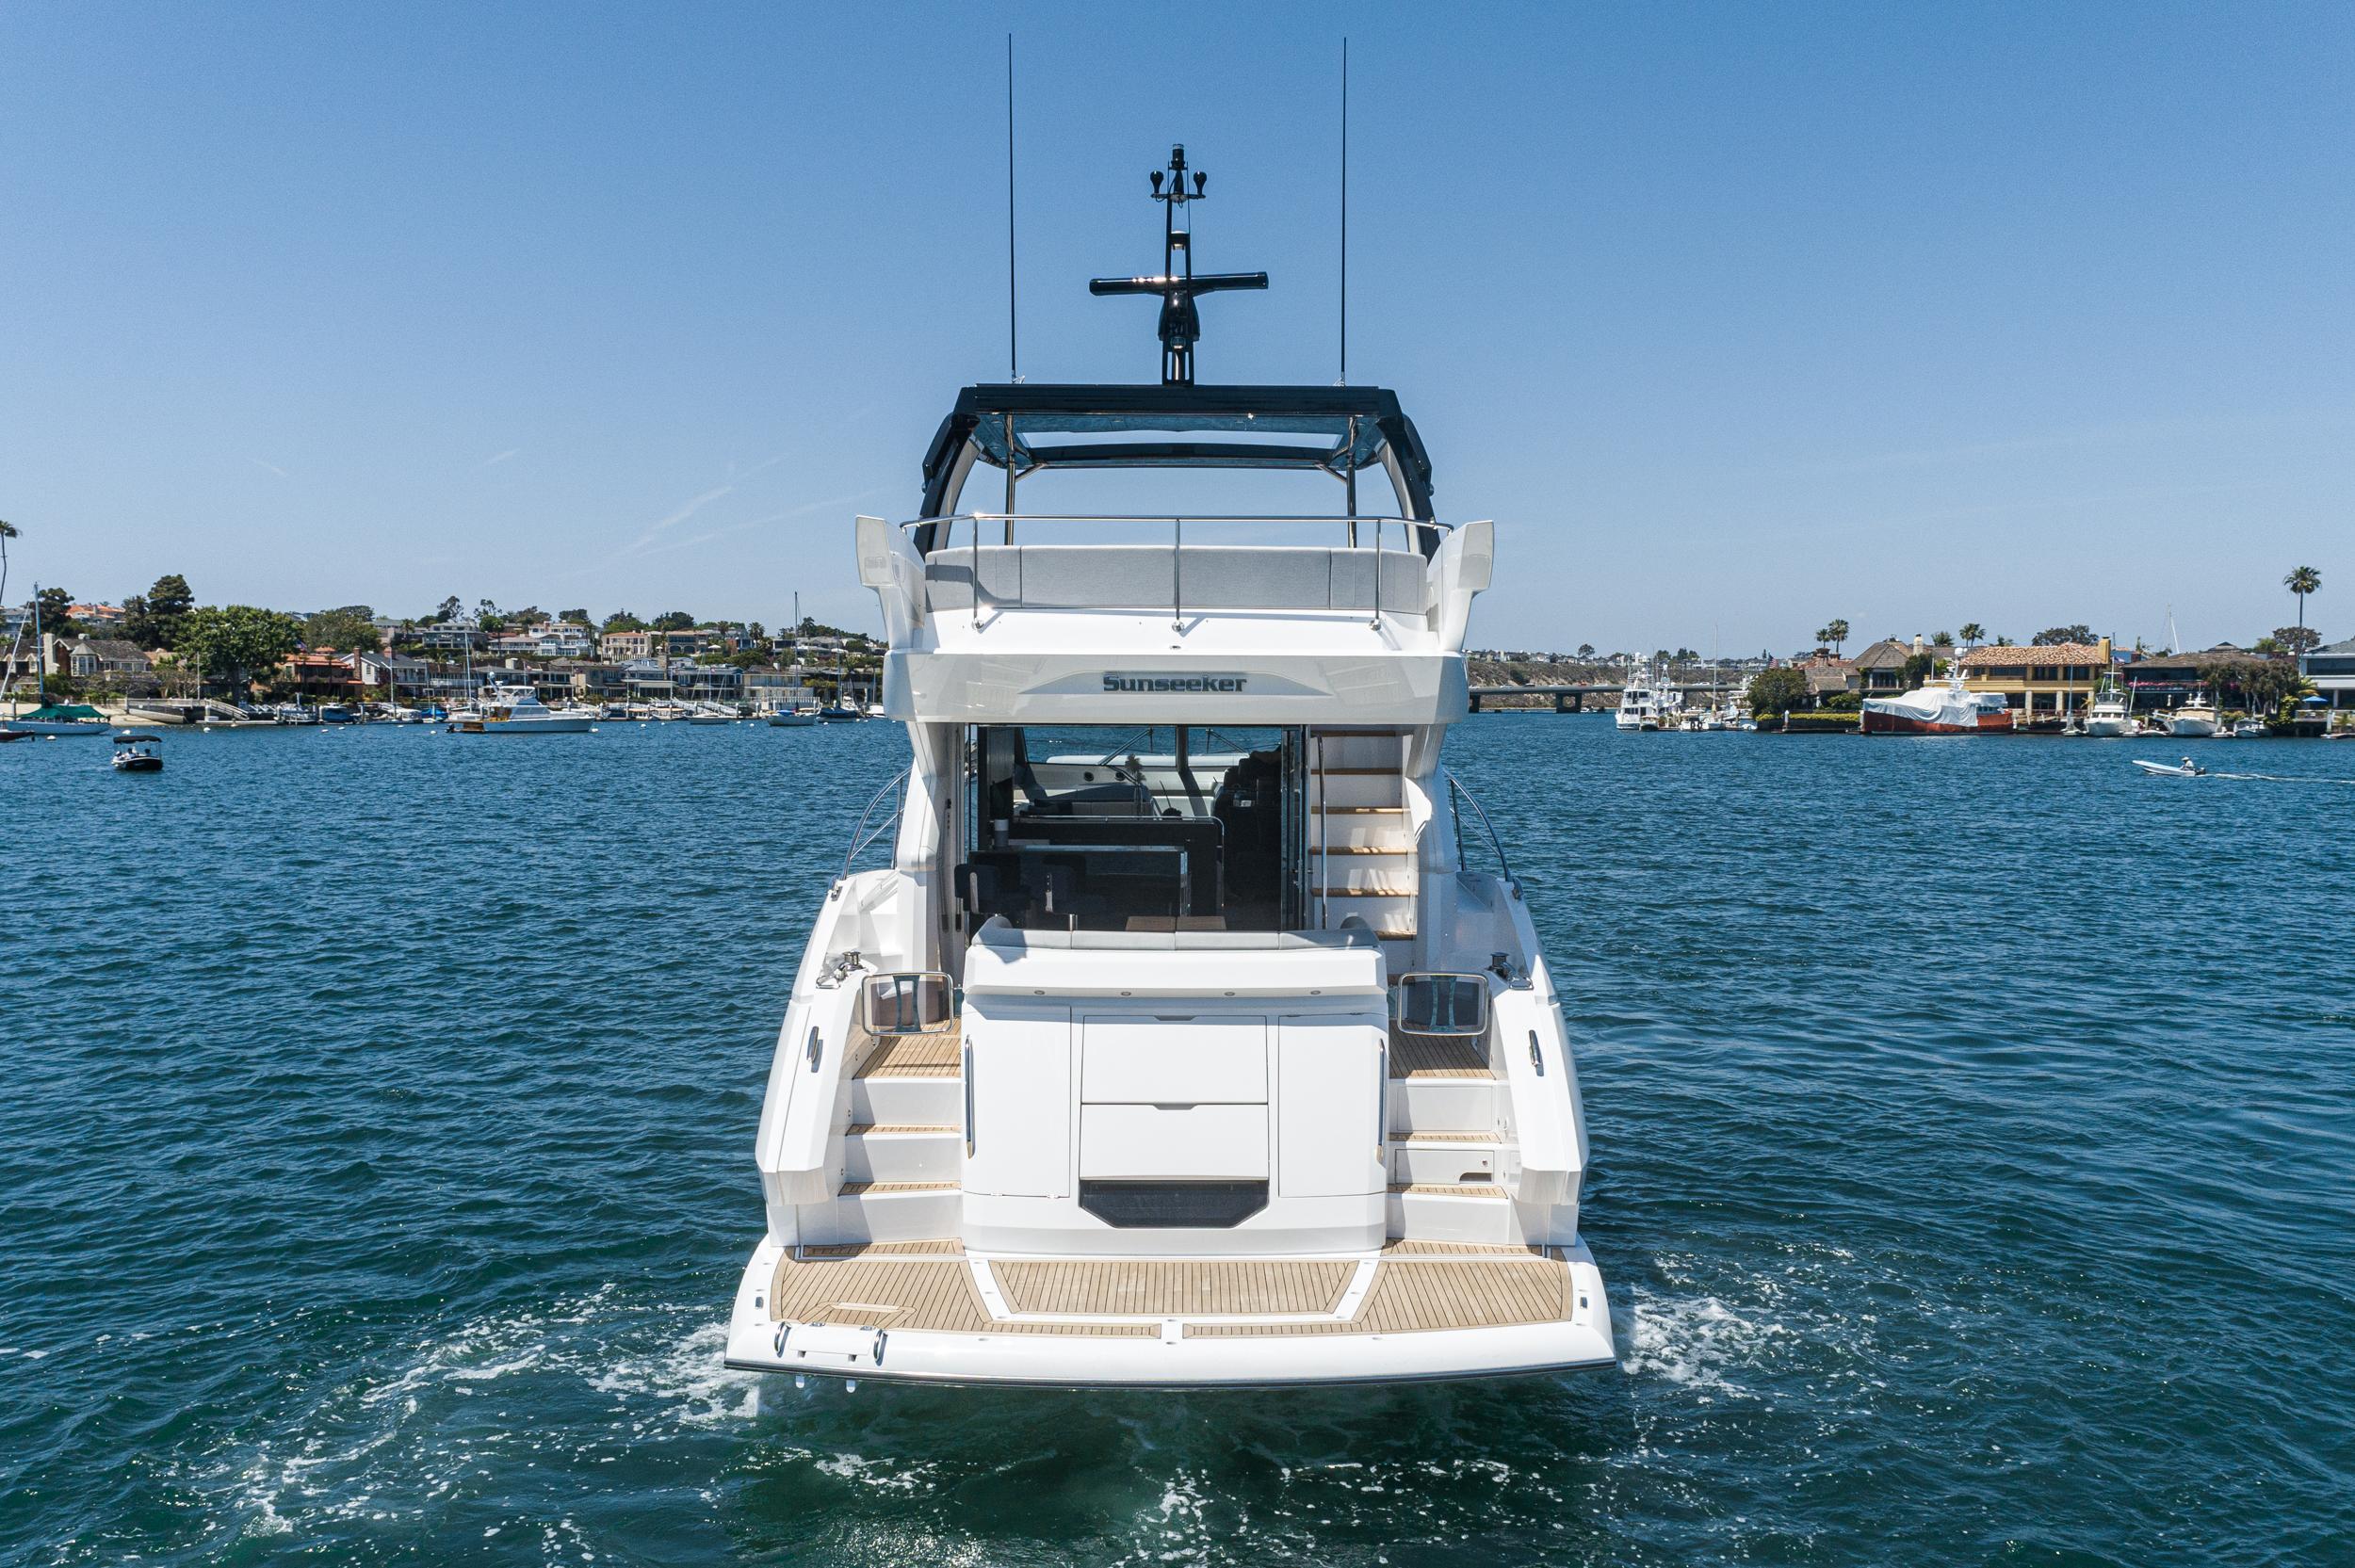 2021 Sunseeker Manhattan 55 #SS315 inventory image at Sun Country Coastal in Newport Beach